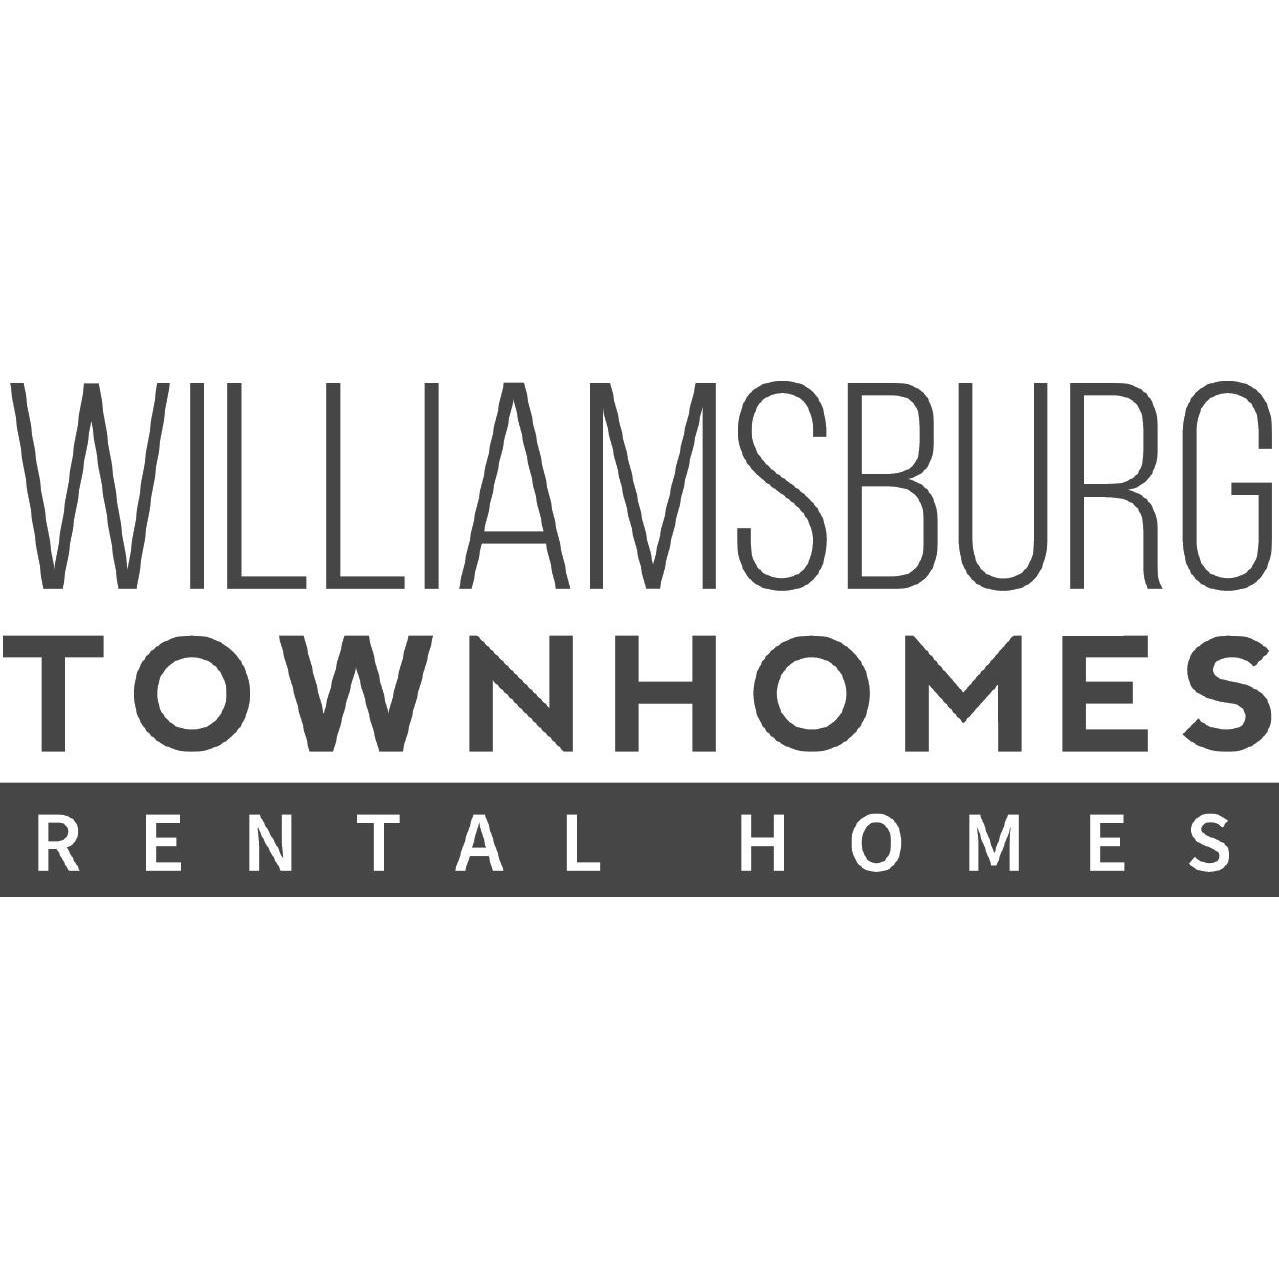 Williamsburg Townhomes Rental Homes